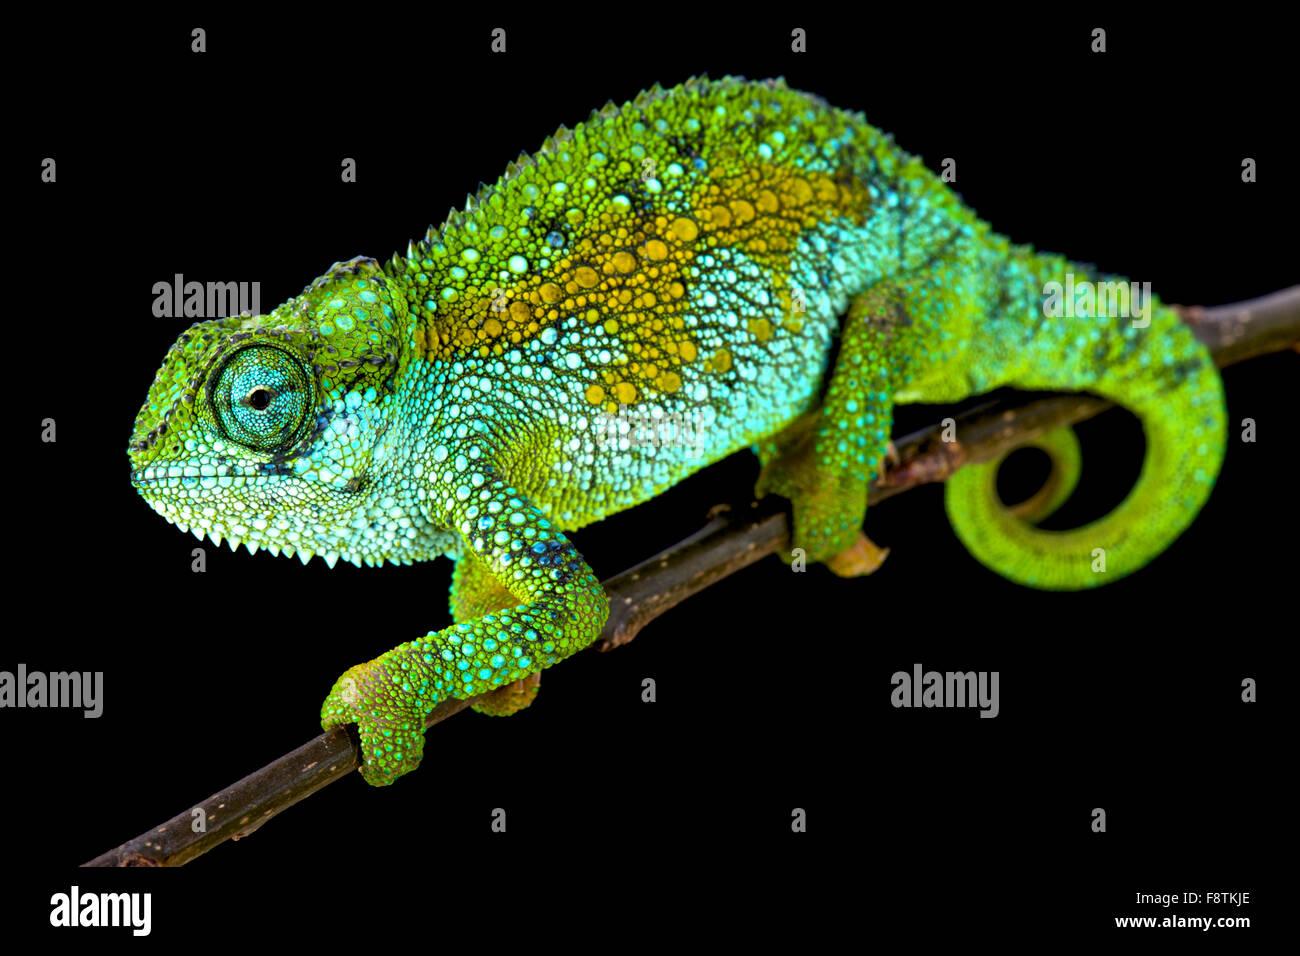 Tanzanian Montane Dwarf Chameleon (Trioceros sternfeldi) - Stock Image